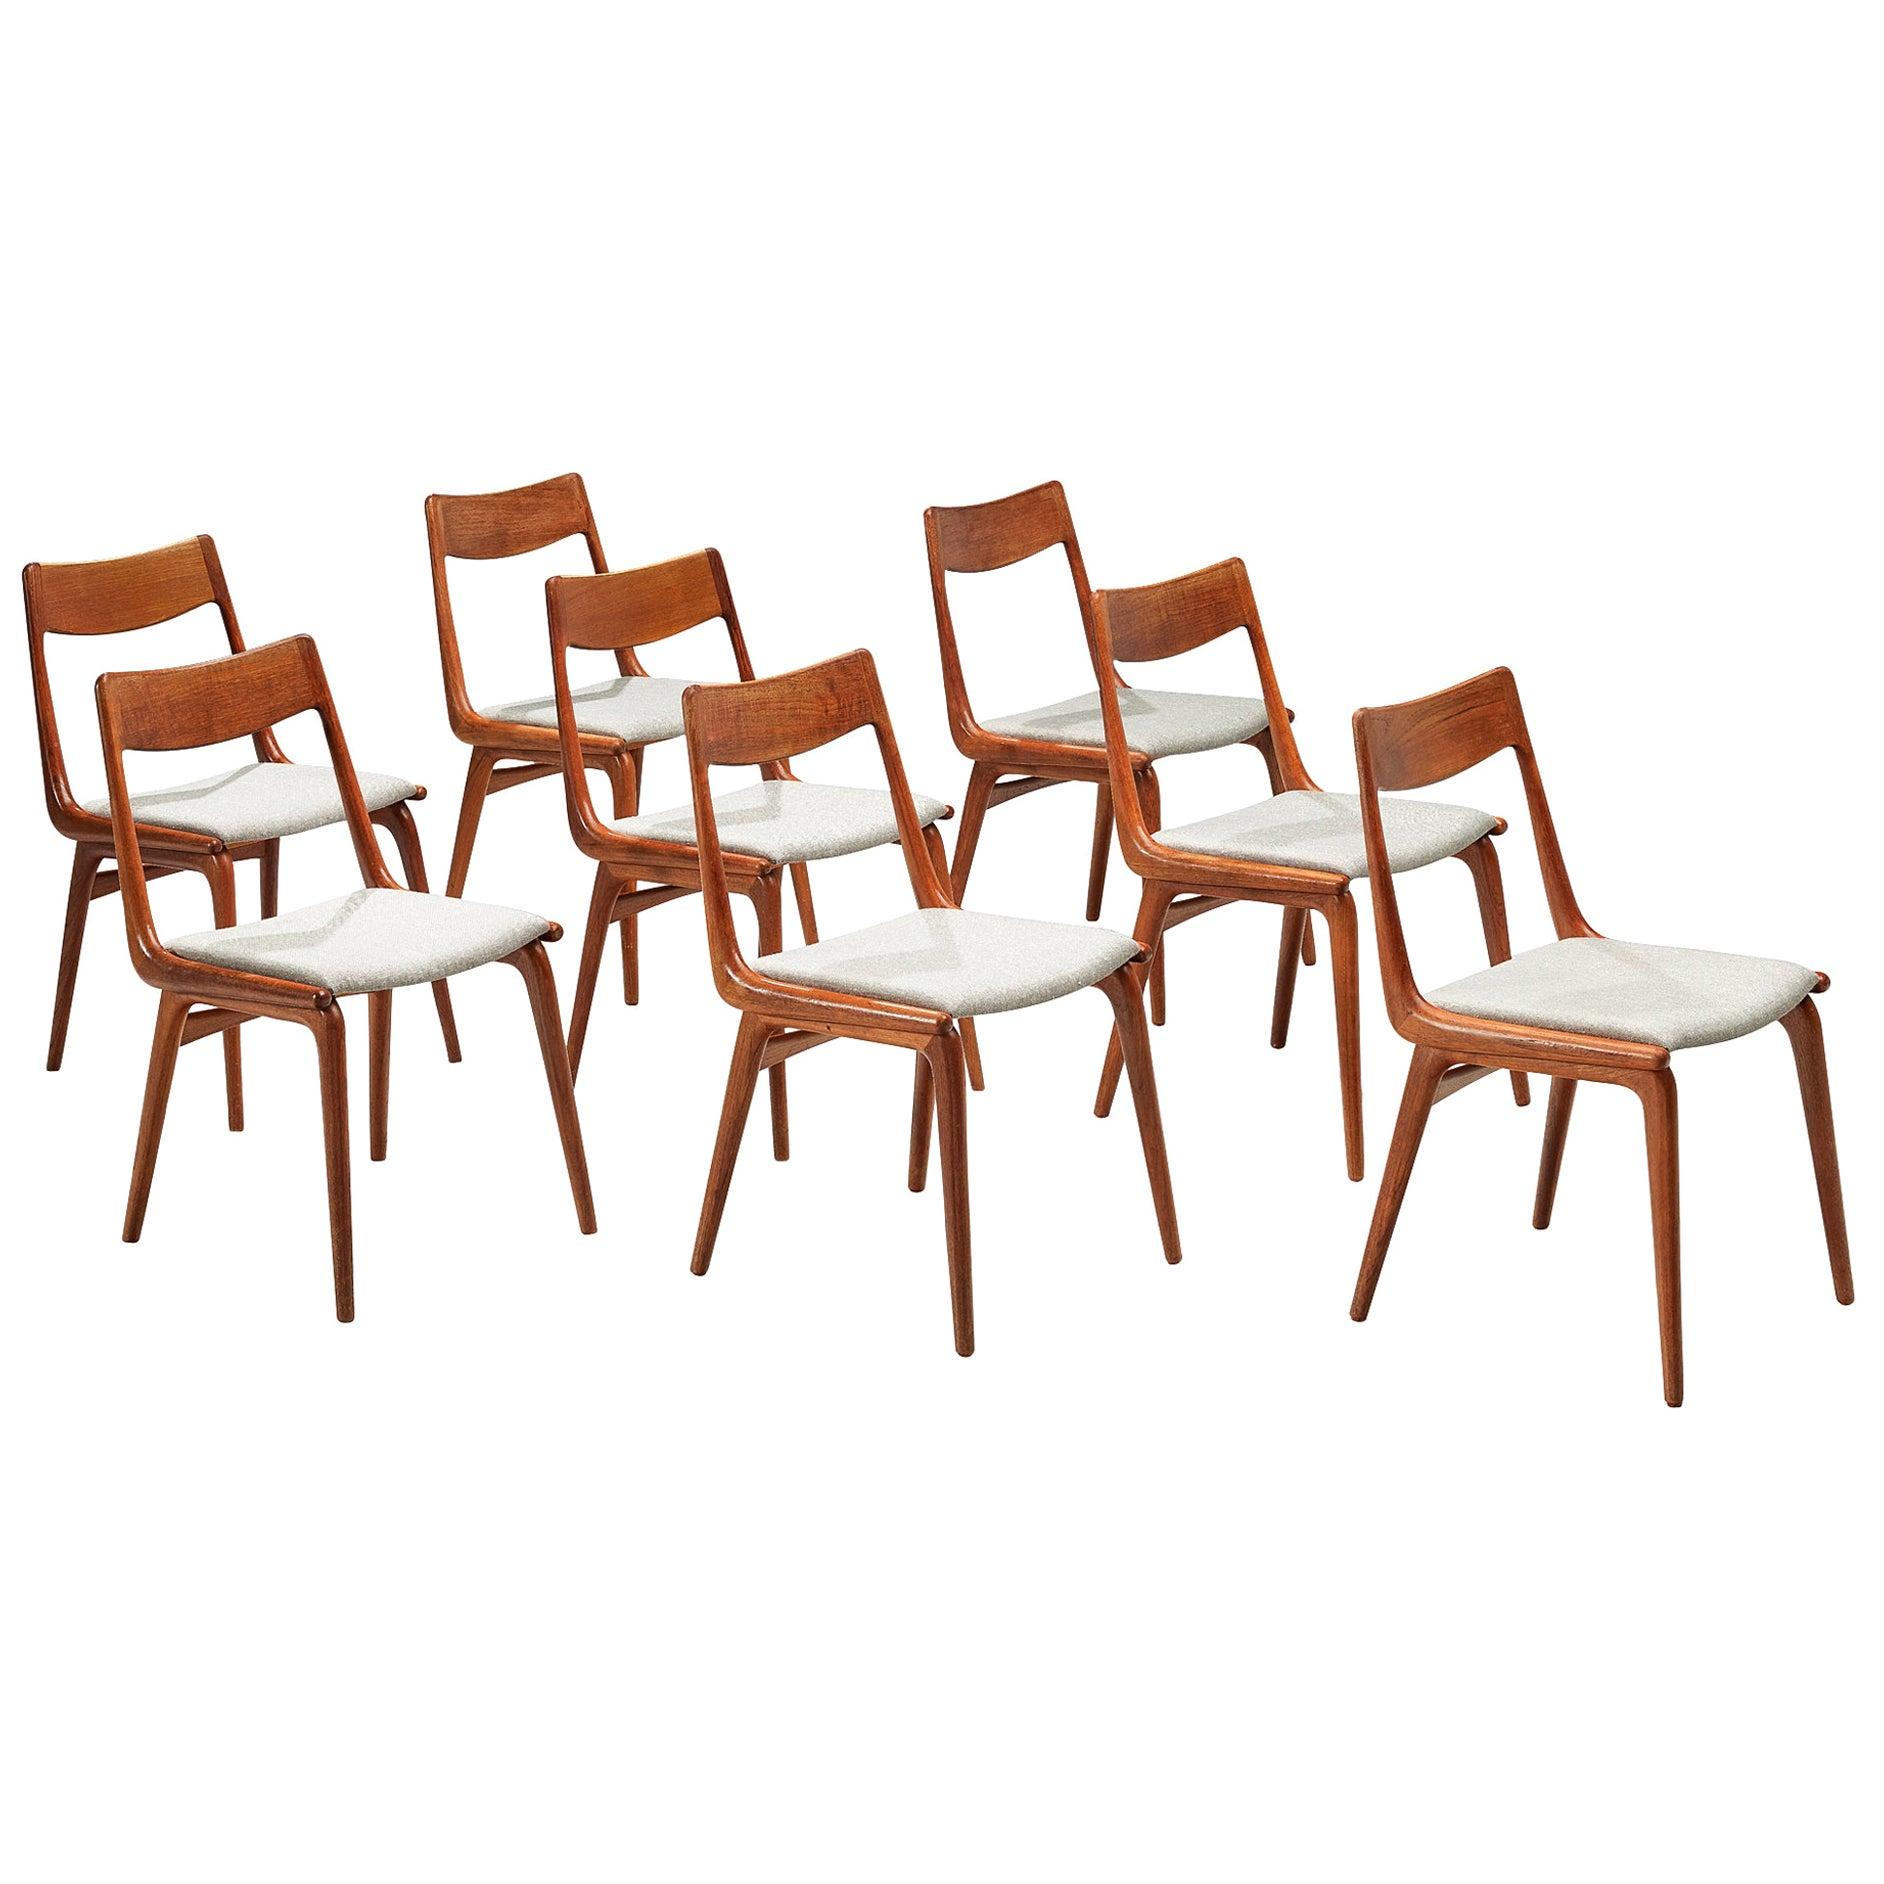 Alfred Christiansen 'Boomerang' Chairs